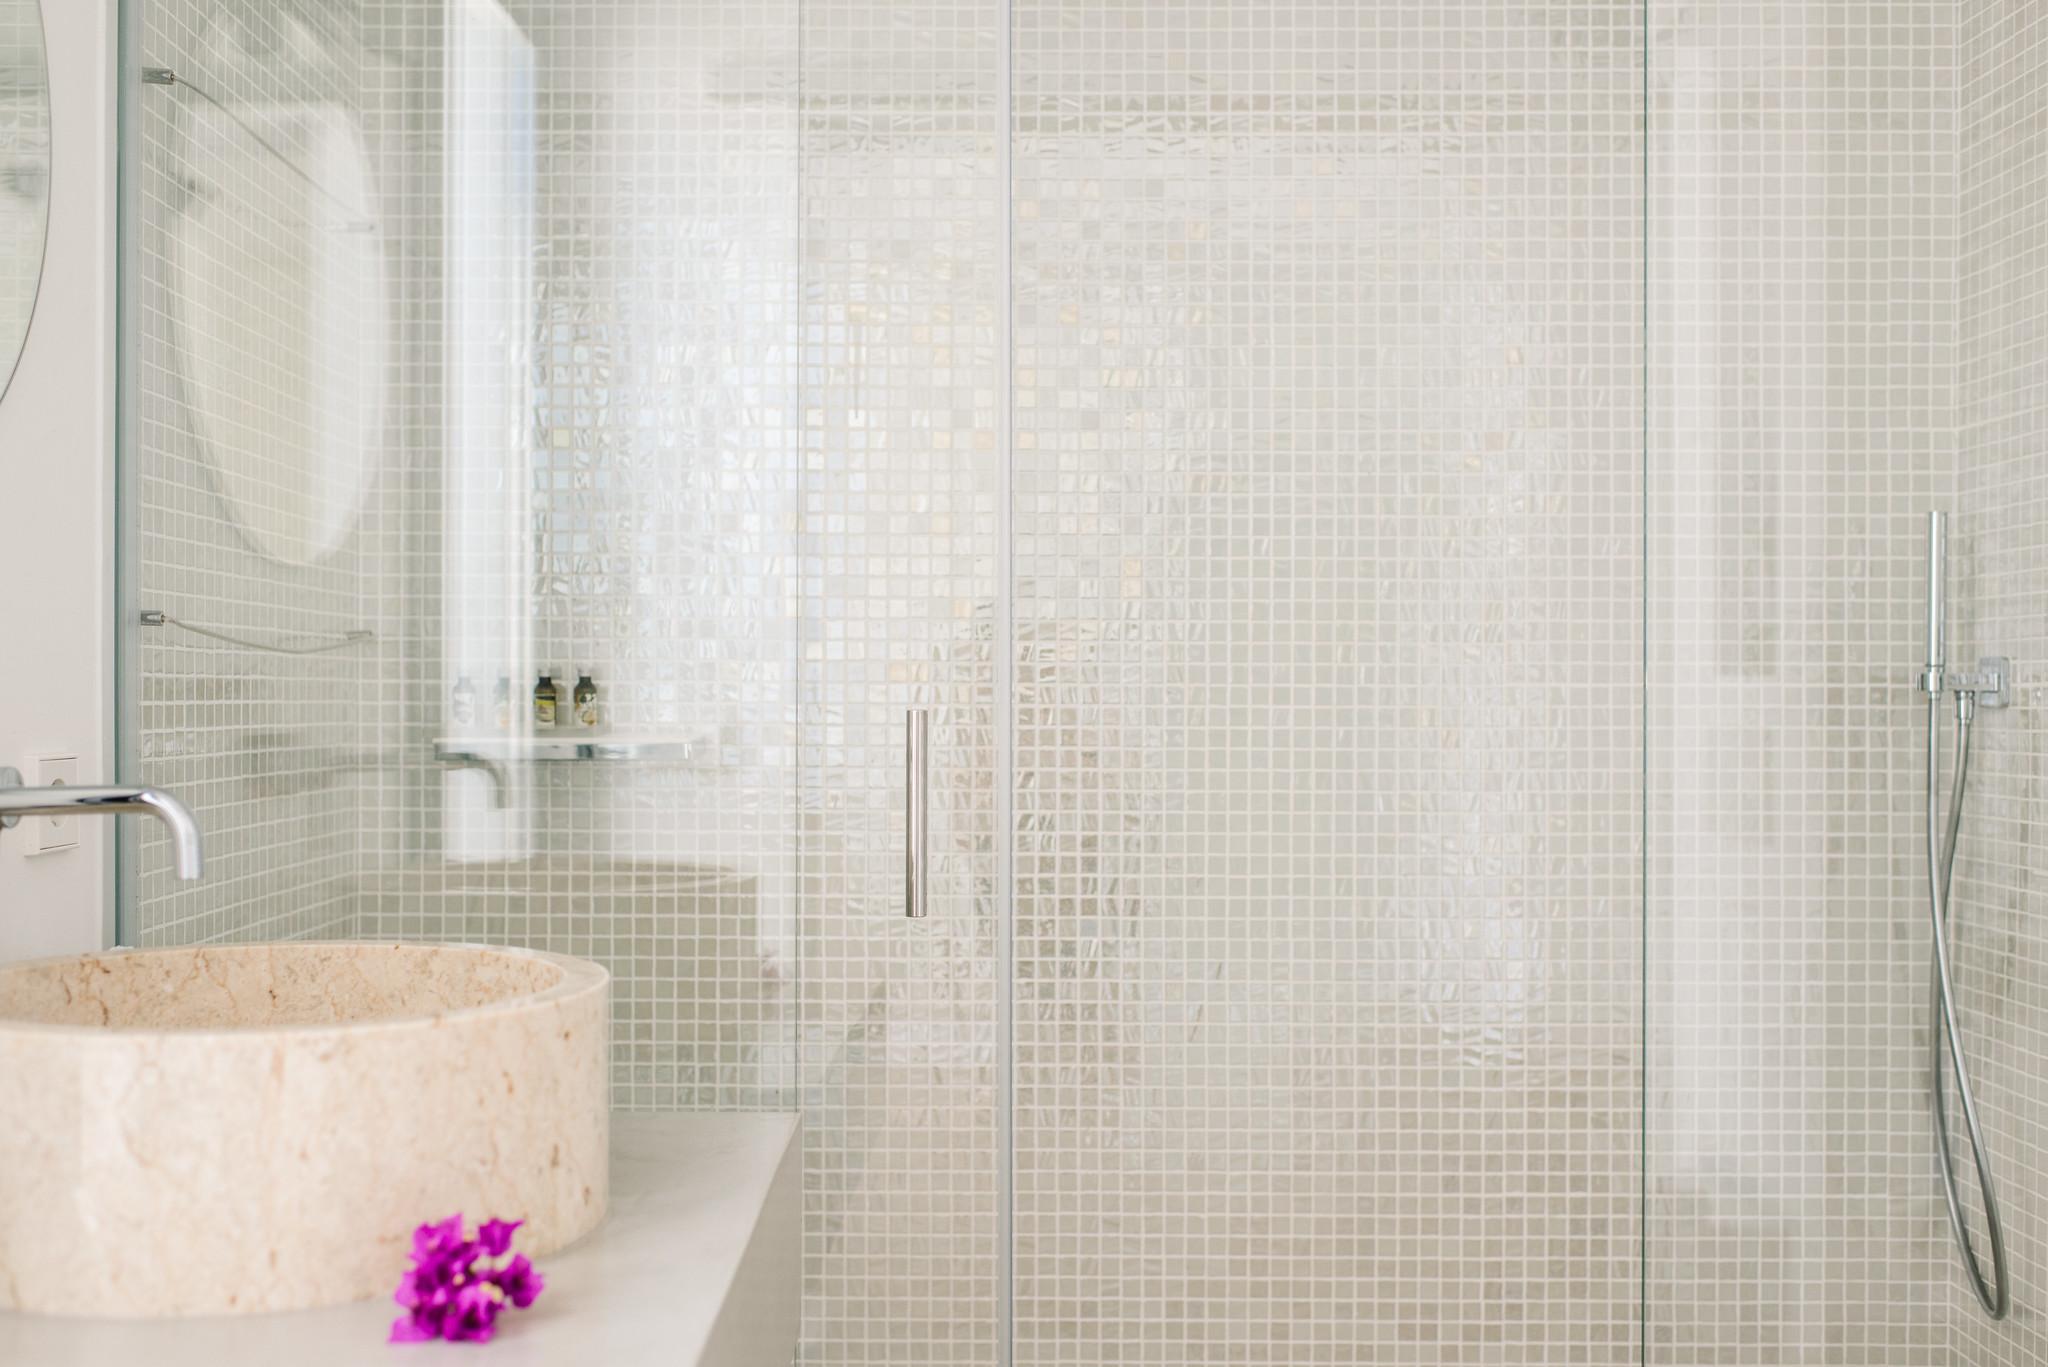 https://www.white-ibiza.com/wp-content/uploads/2020/06/white-ibiza-villas-can-jondal-interior-bathroom-1.jpg